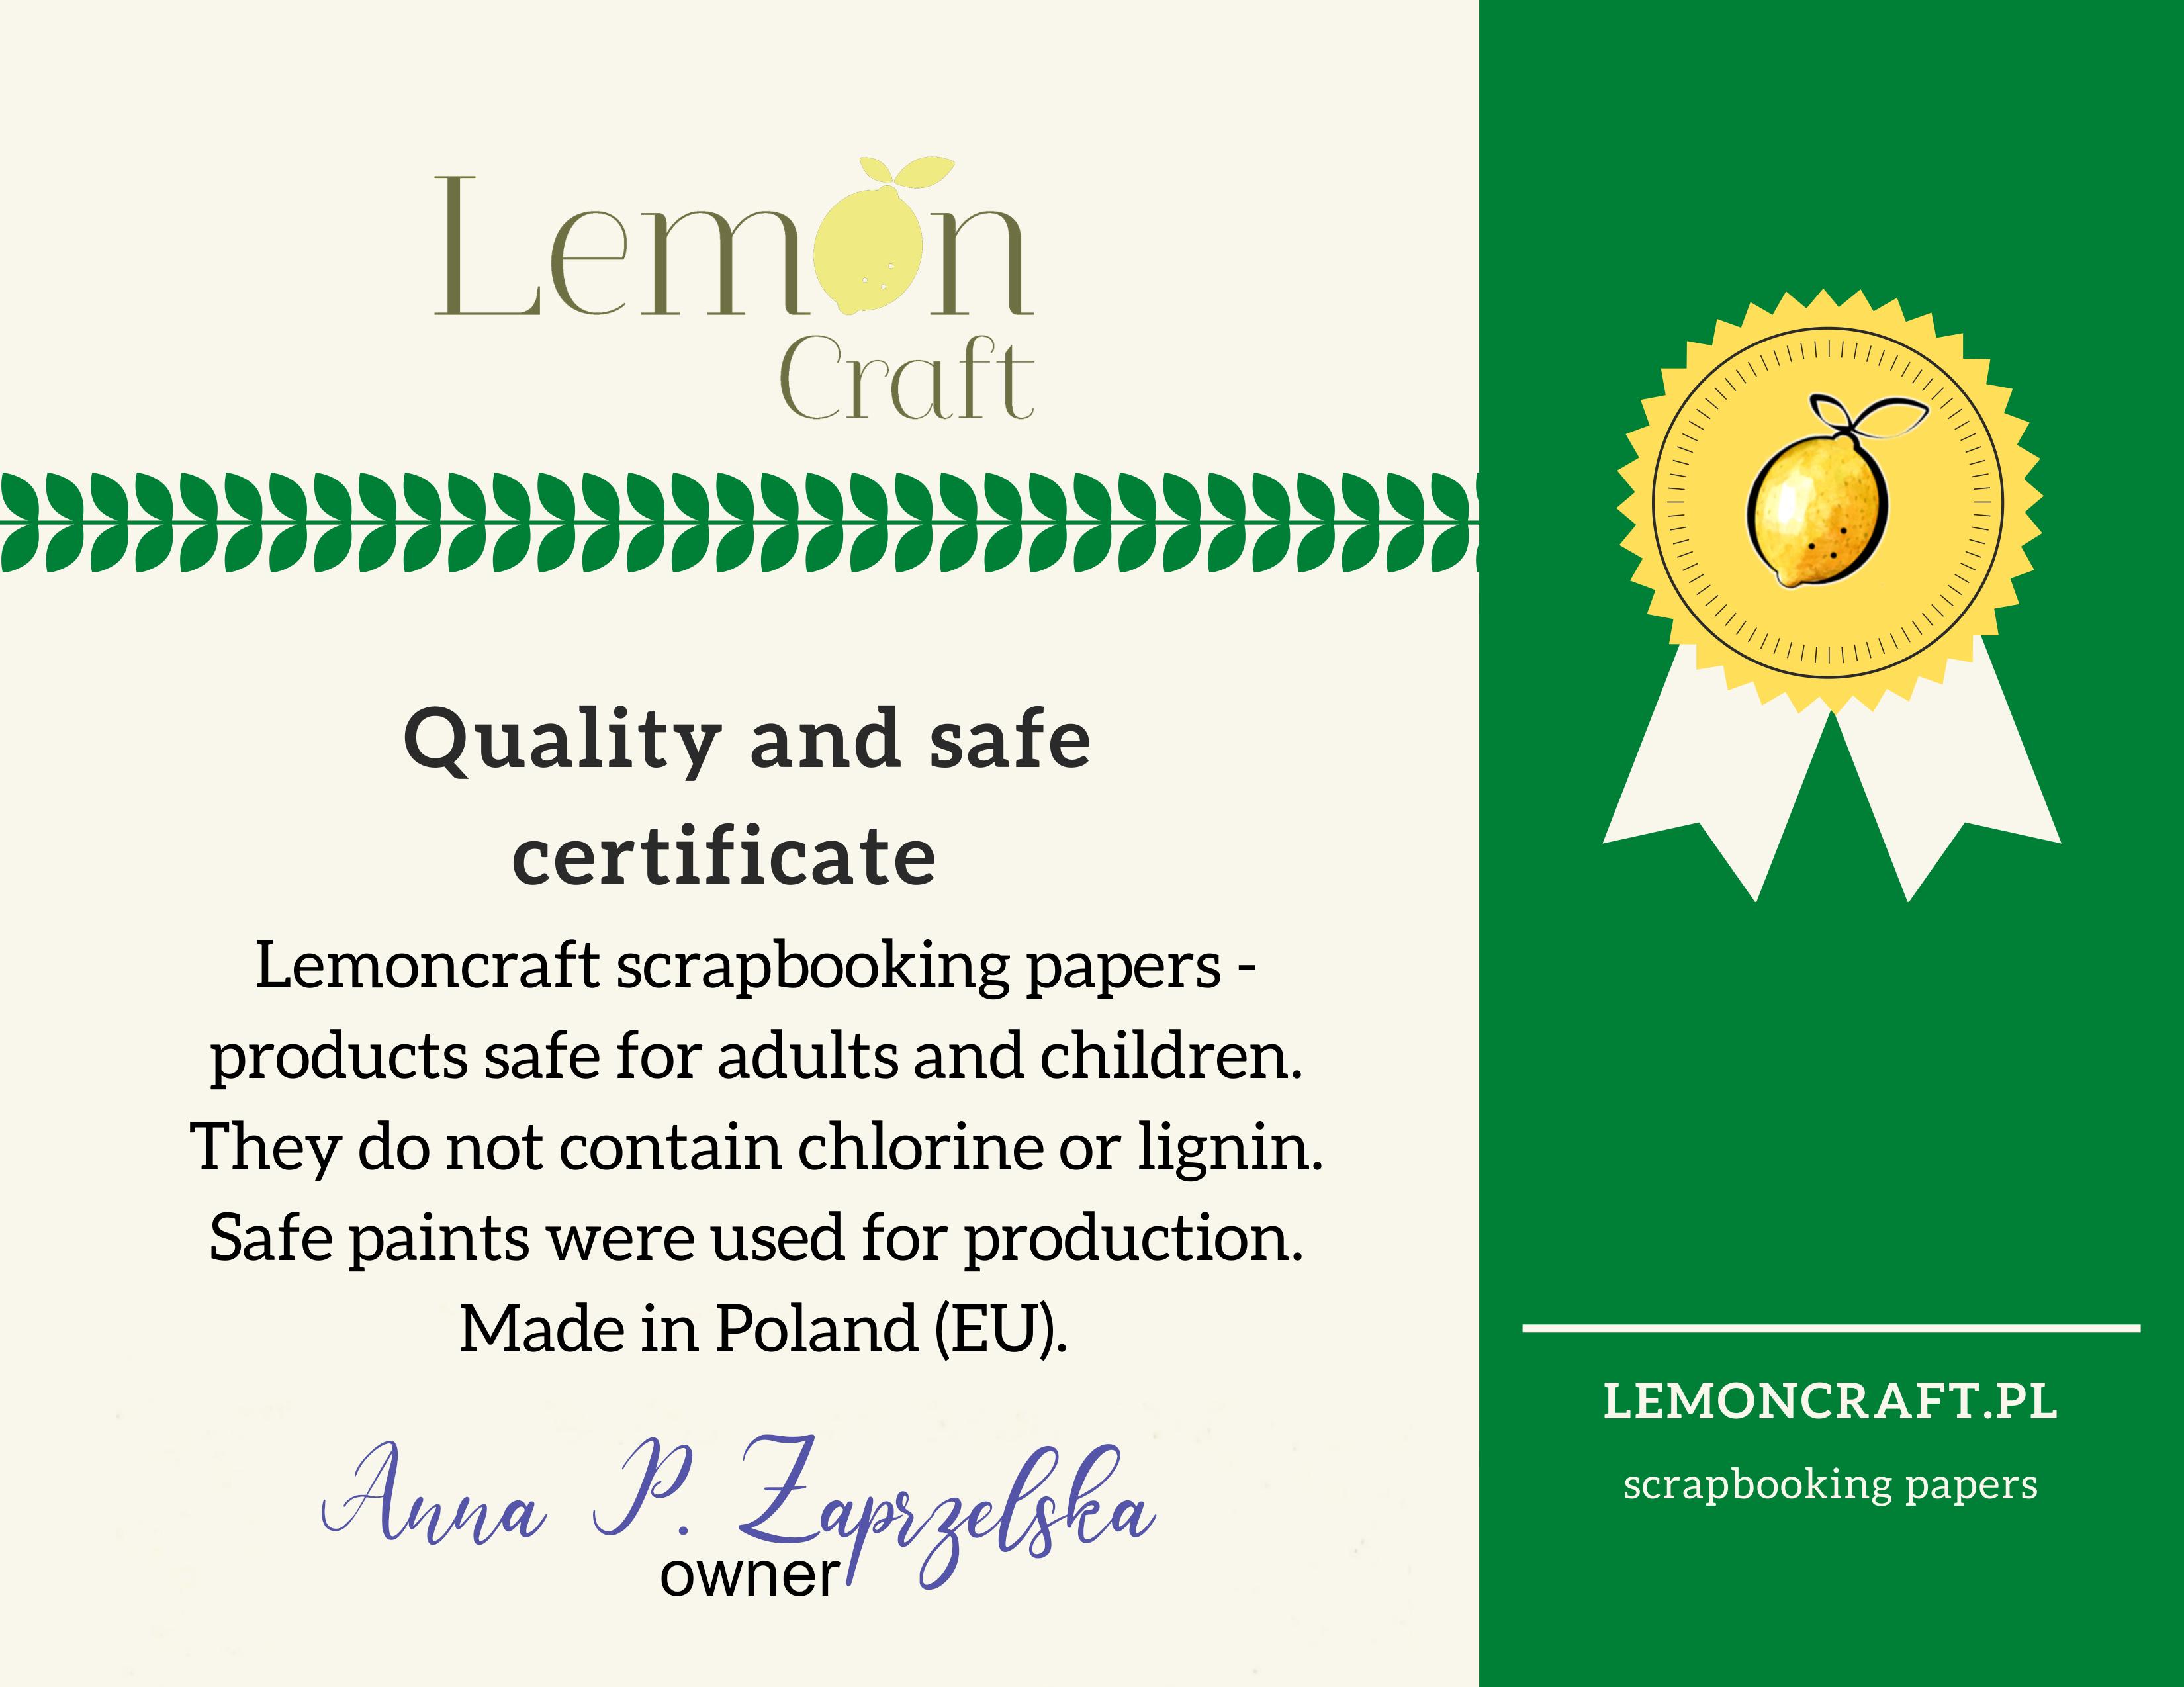 LemonCraft certifikat